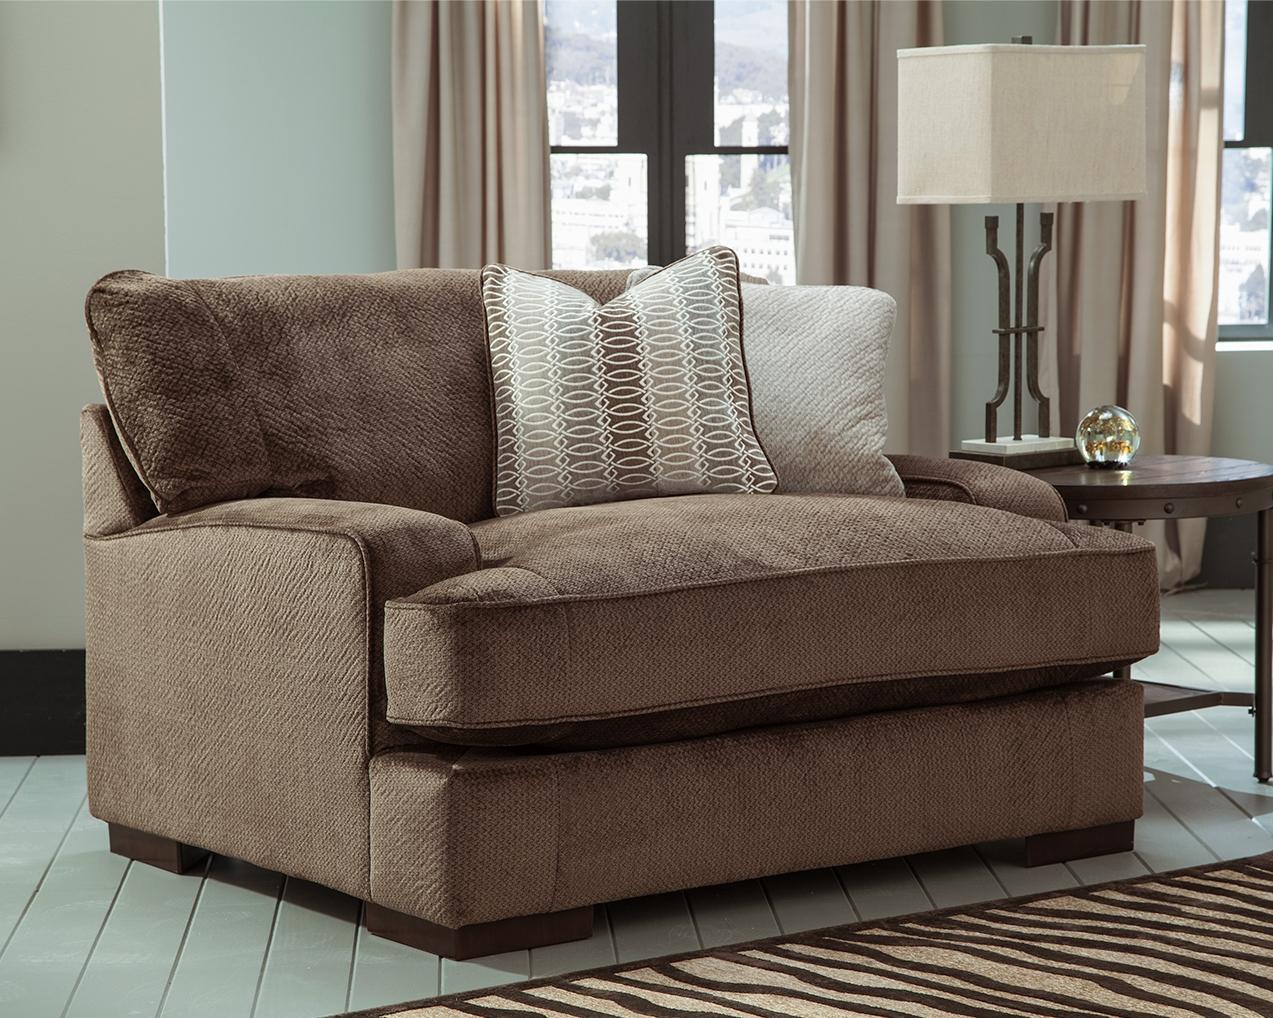 Fielding Oversized Chair - 4210123 | Ashley HomeStore